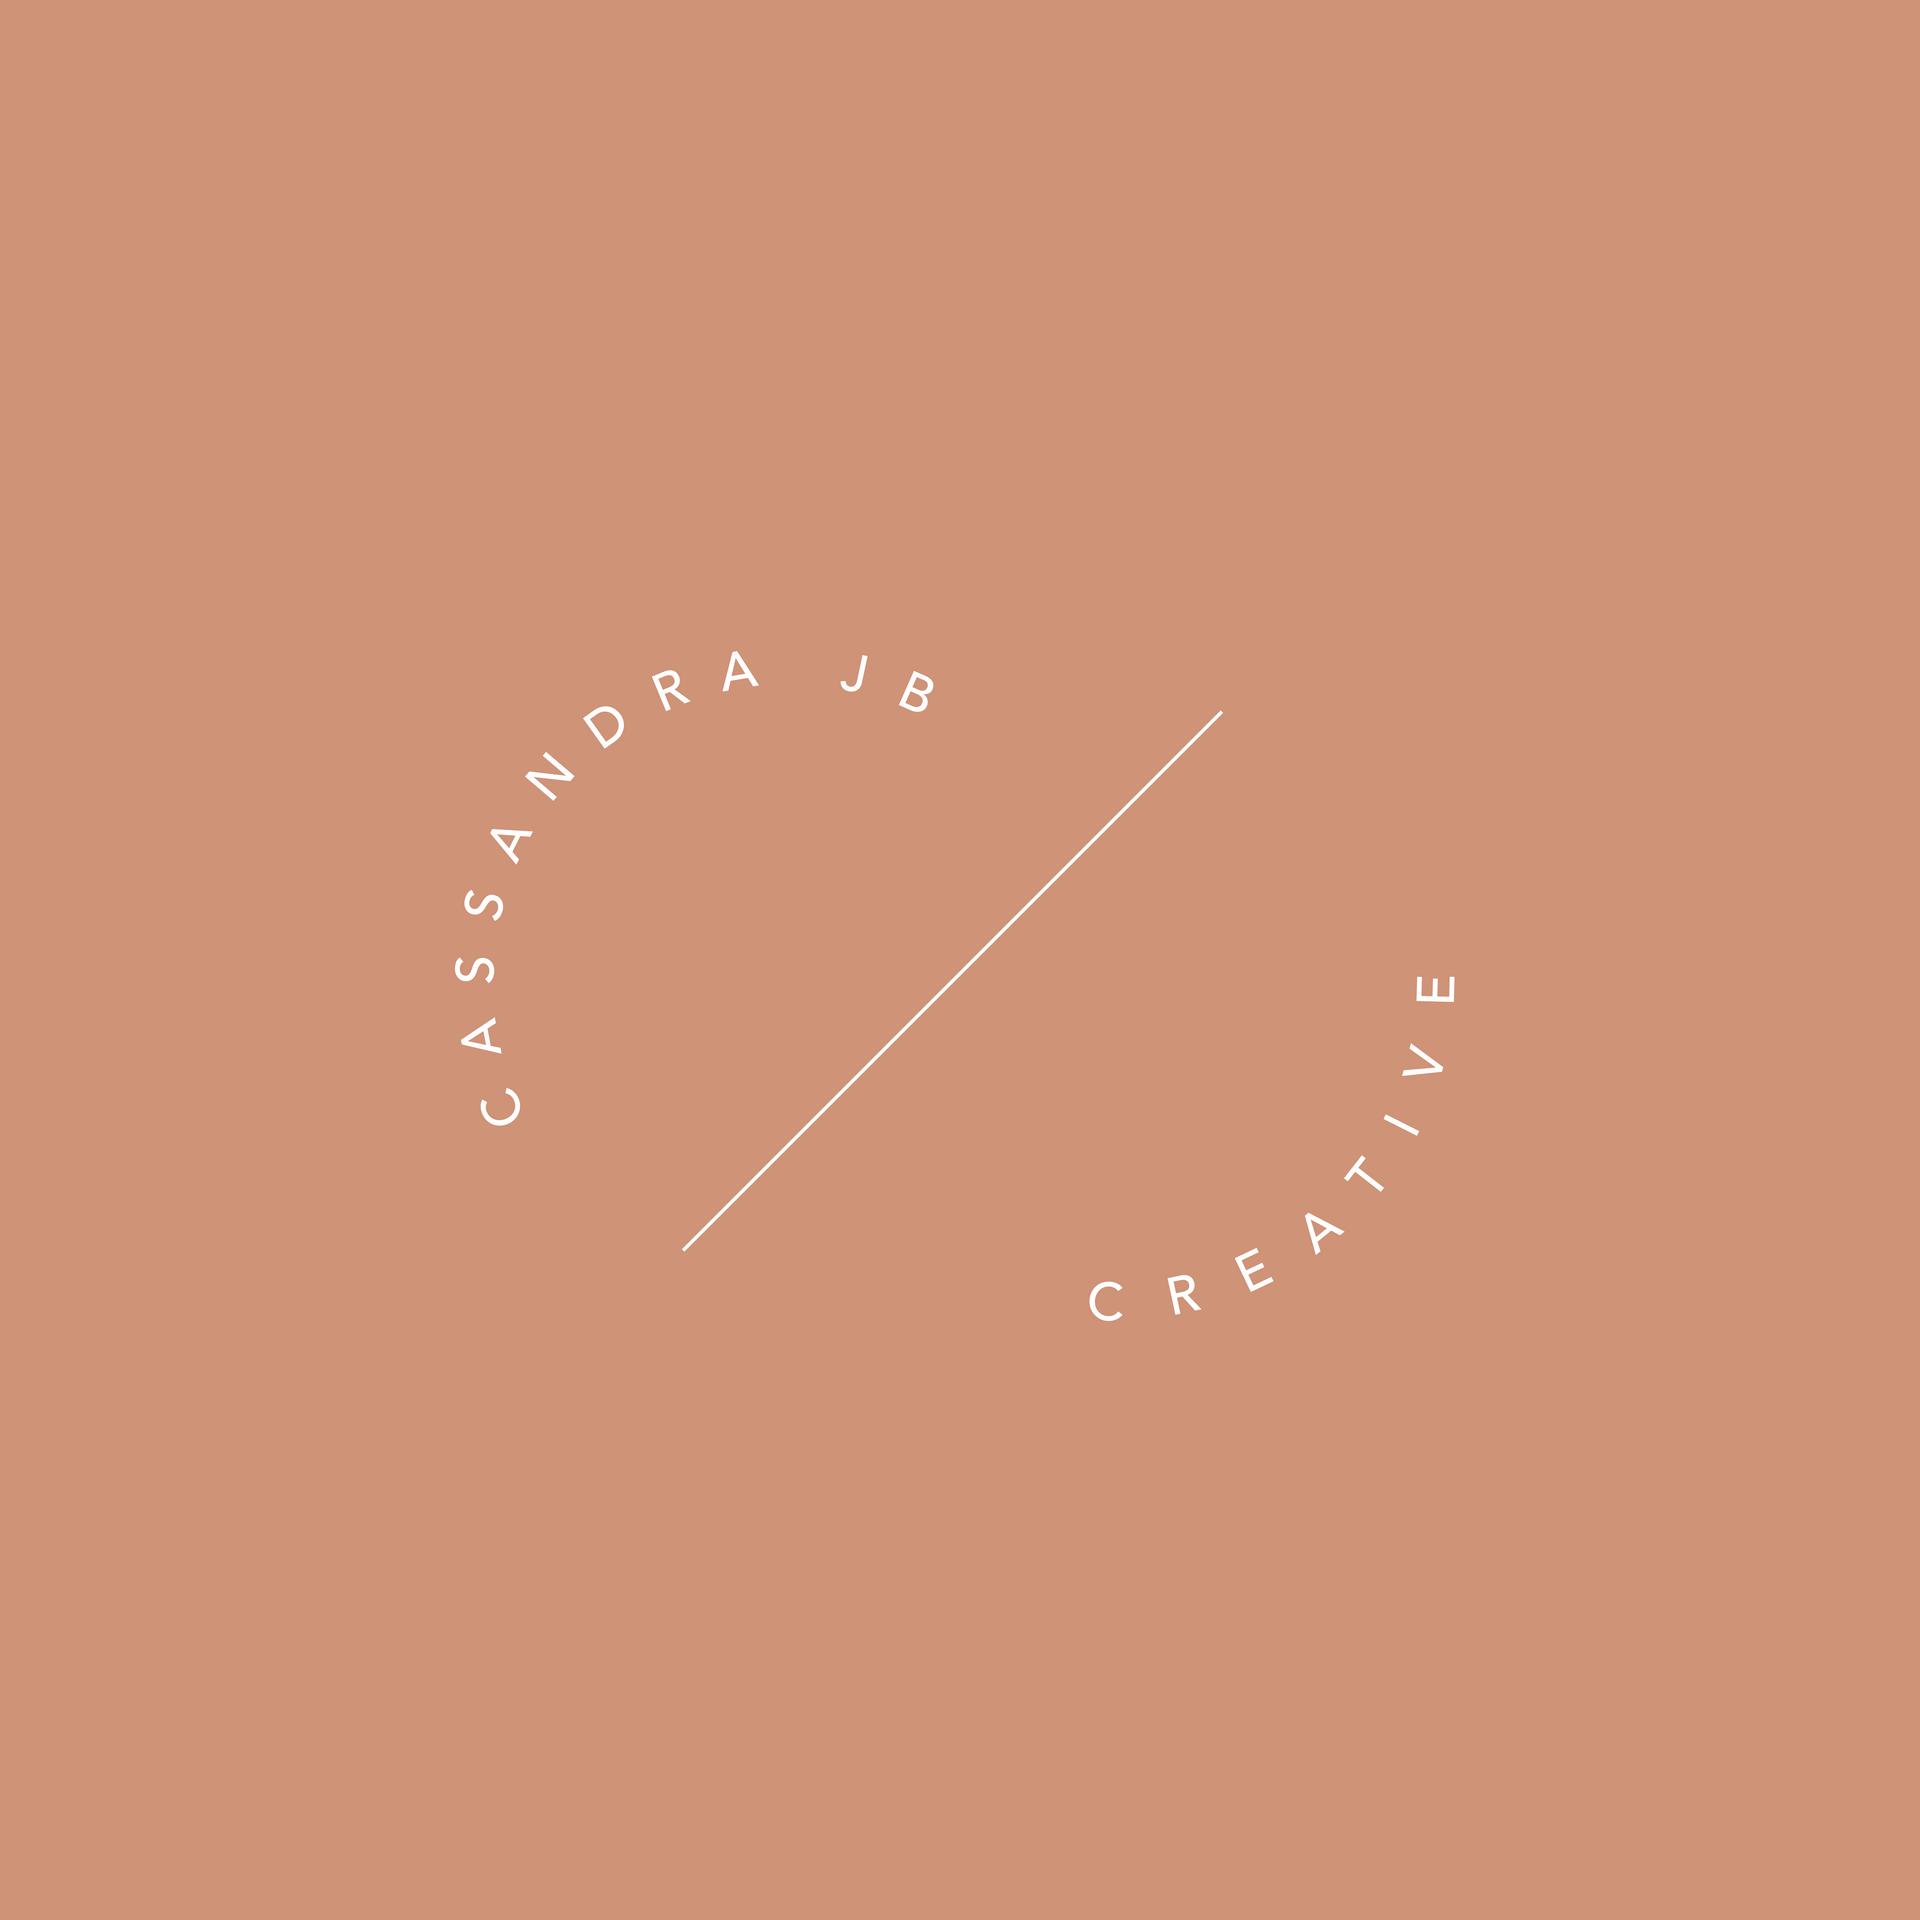 Branding for Creatives | Brand Identity Design by Fresh Leaf Creative